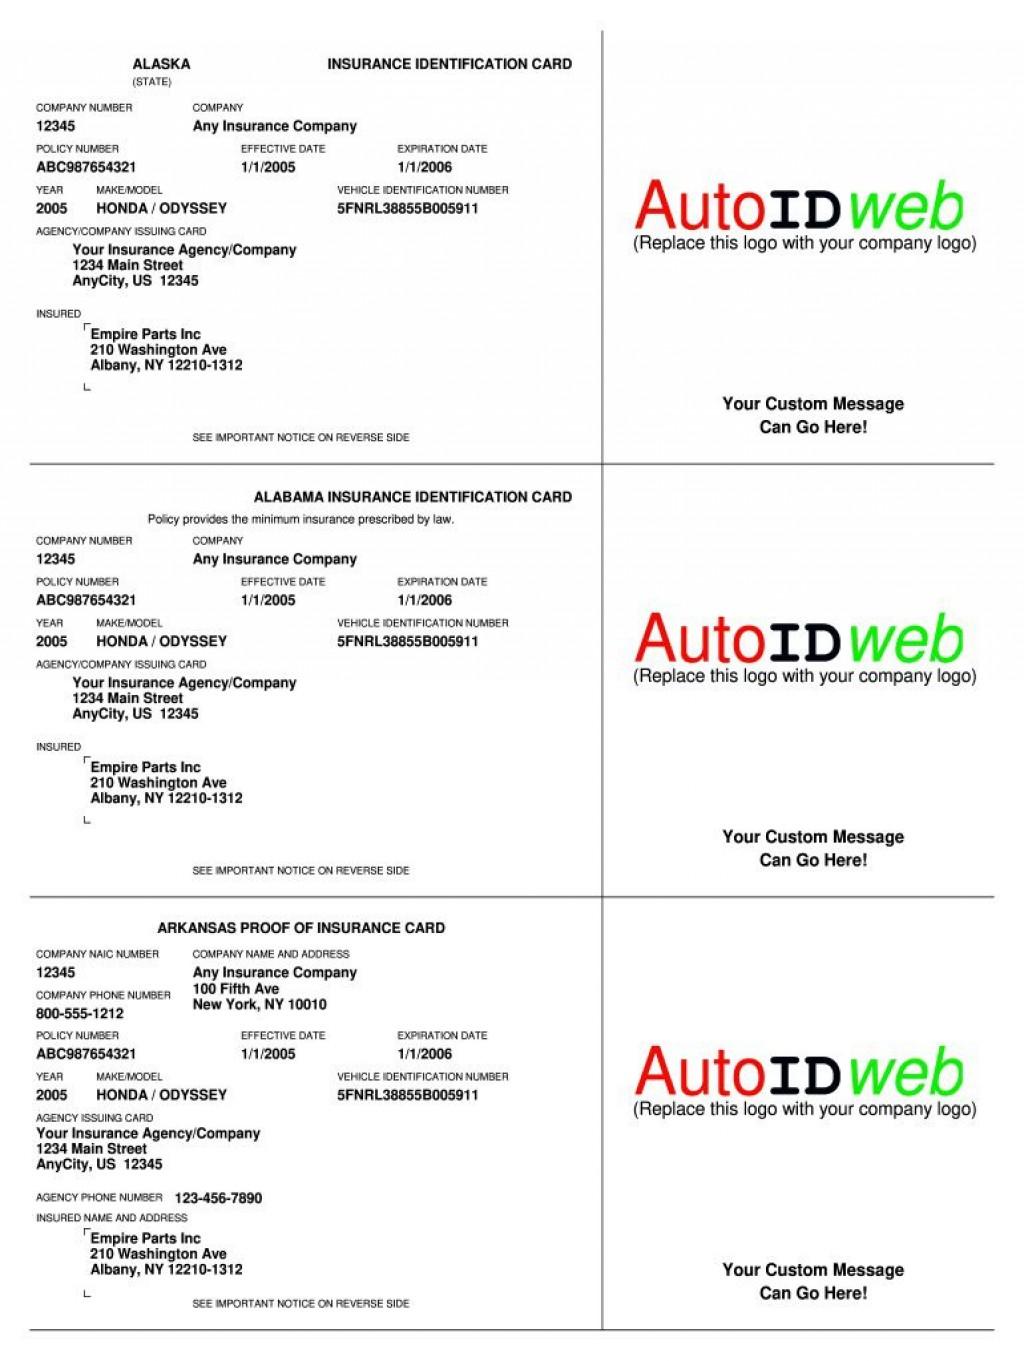 003 Singular Auto Insurance Card Template Pdf High Definition  Car Fake Geico FillerLarge